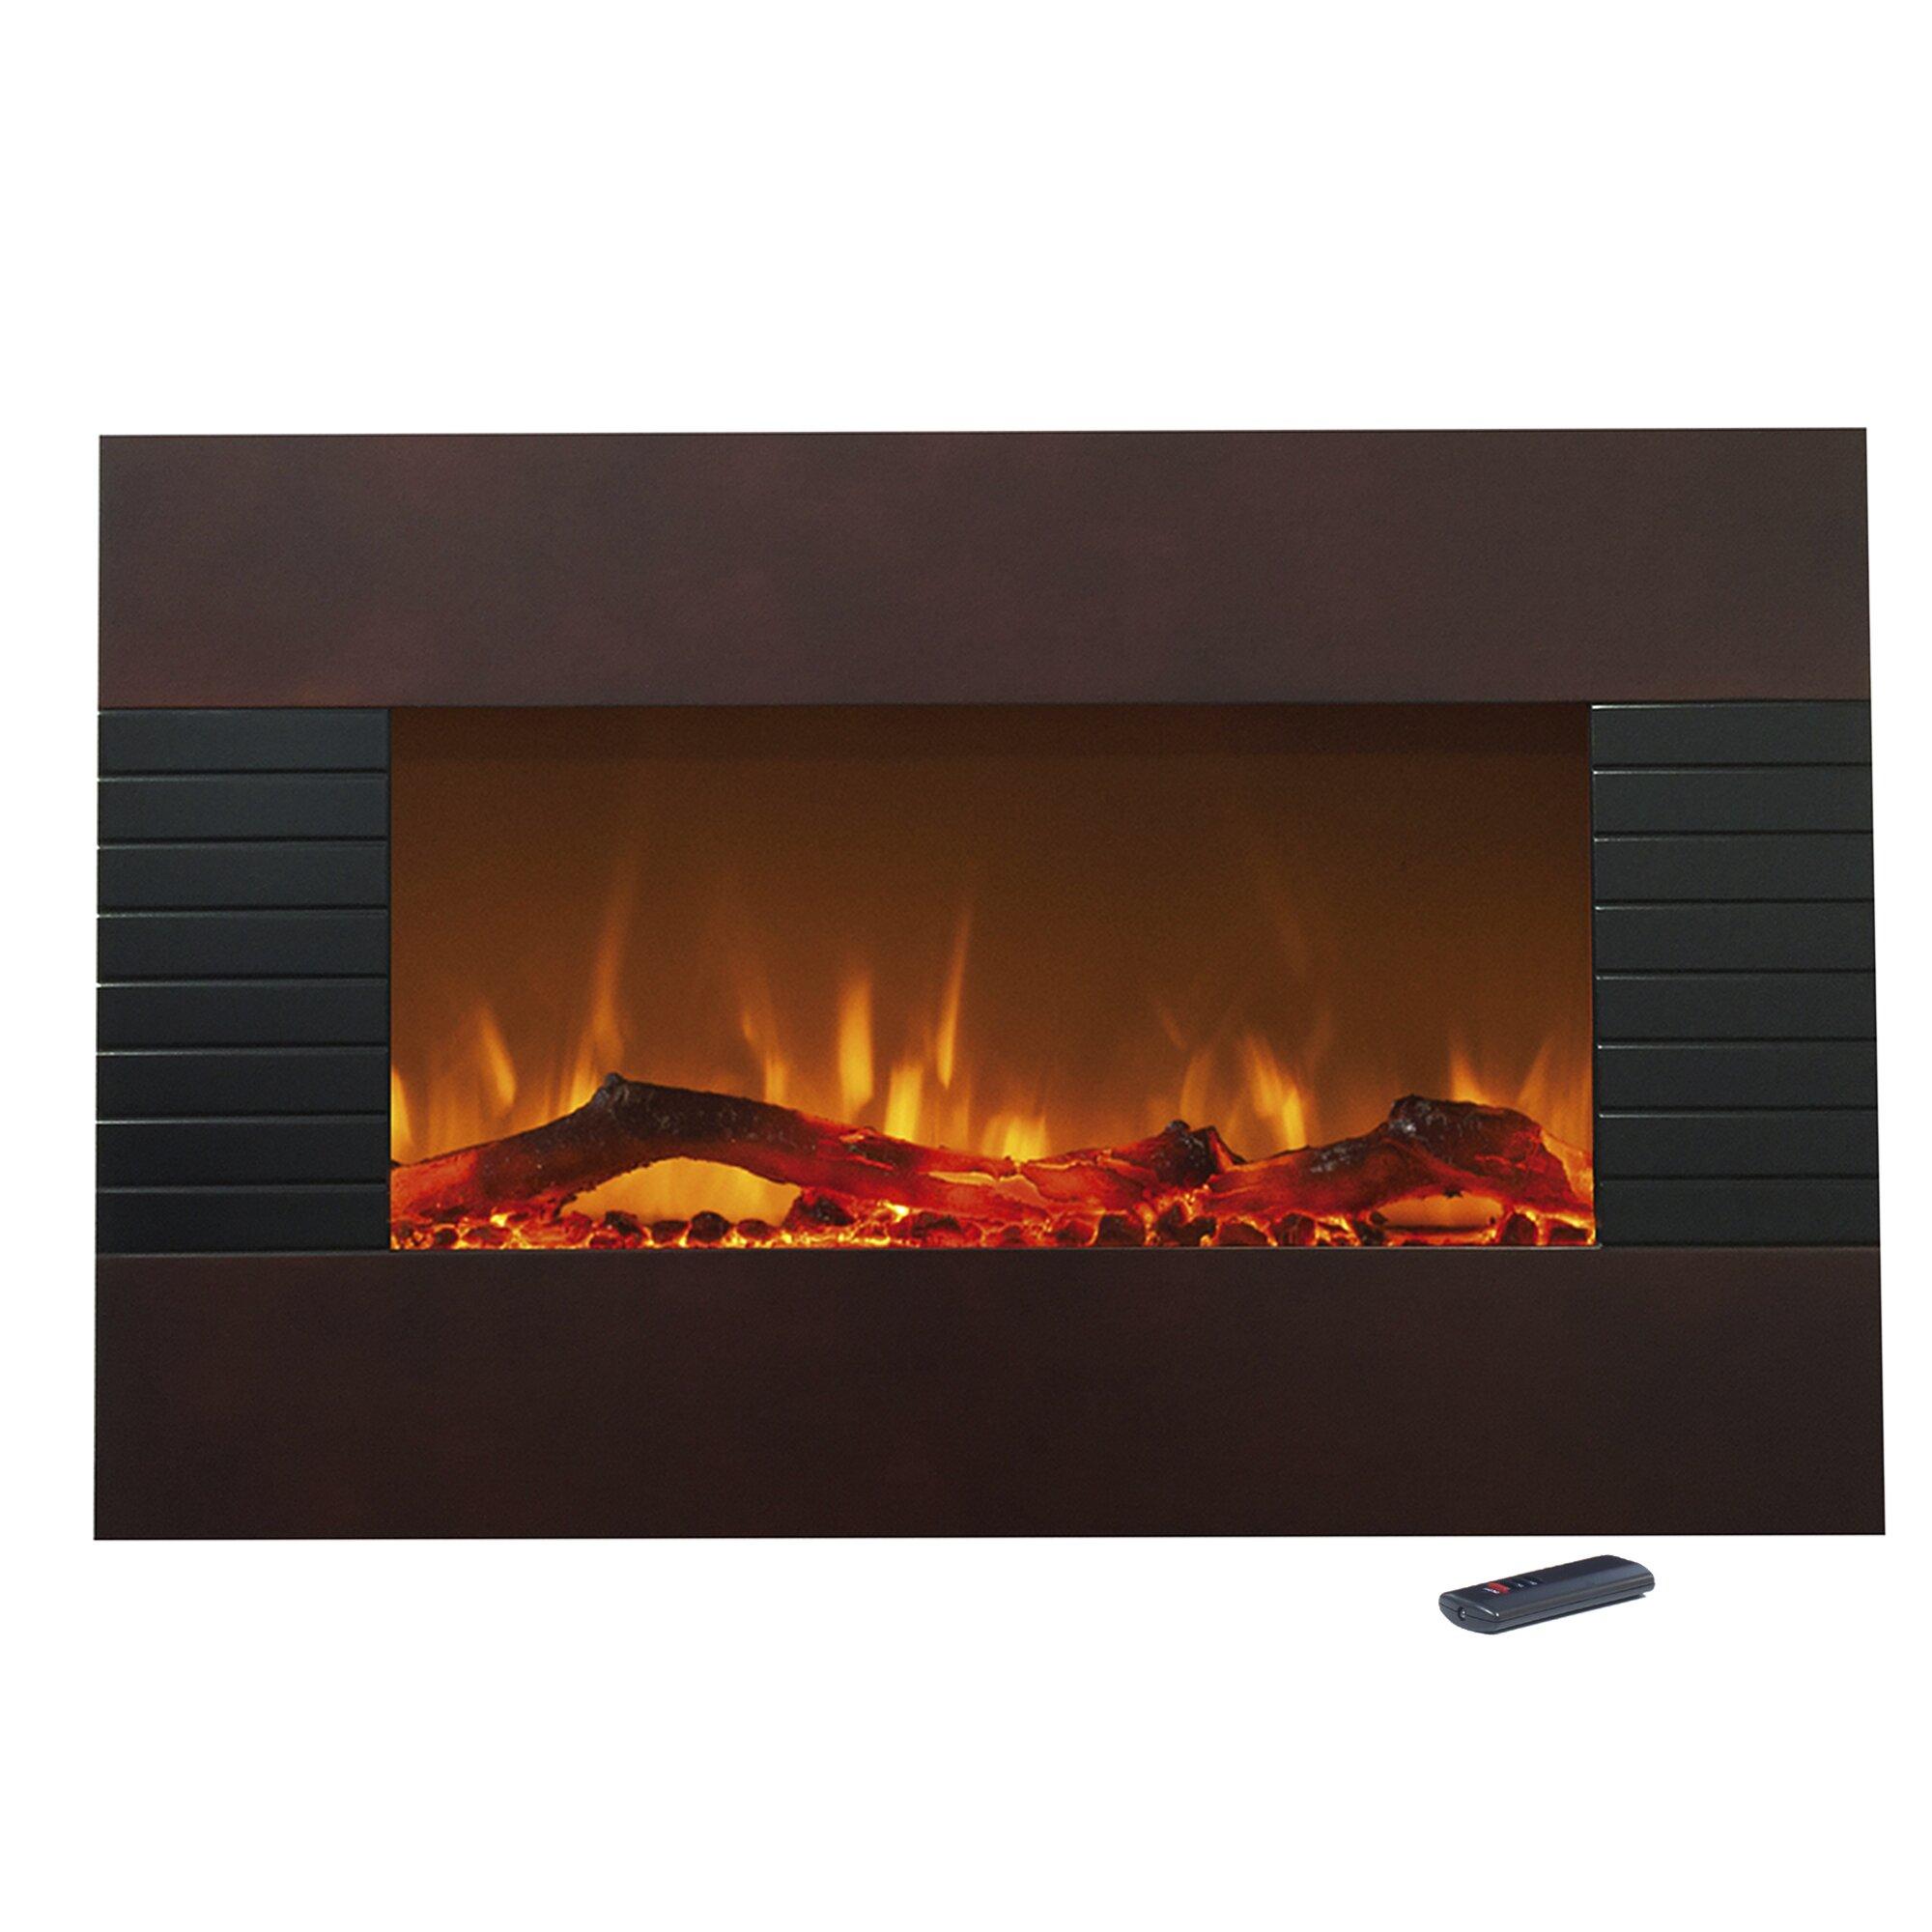 Northwest Wall Mount Electric Fireplace Reviews Wayfair